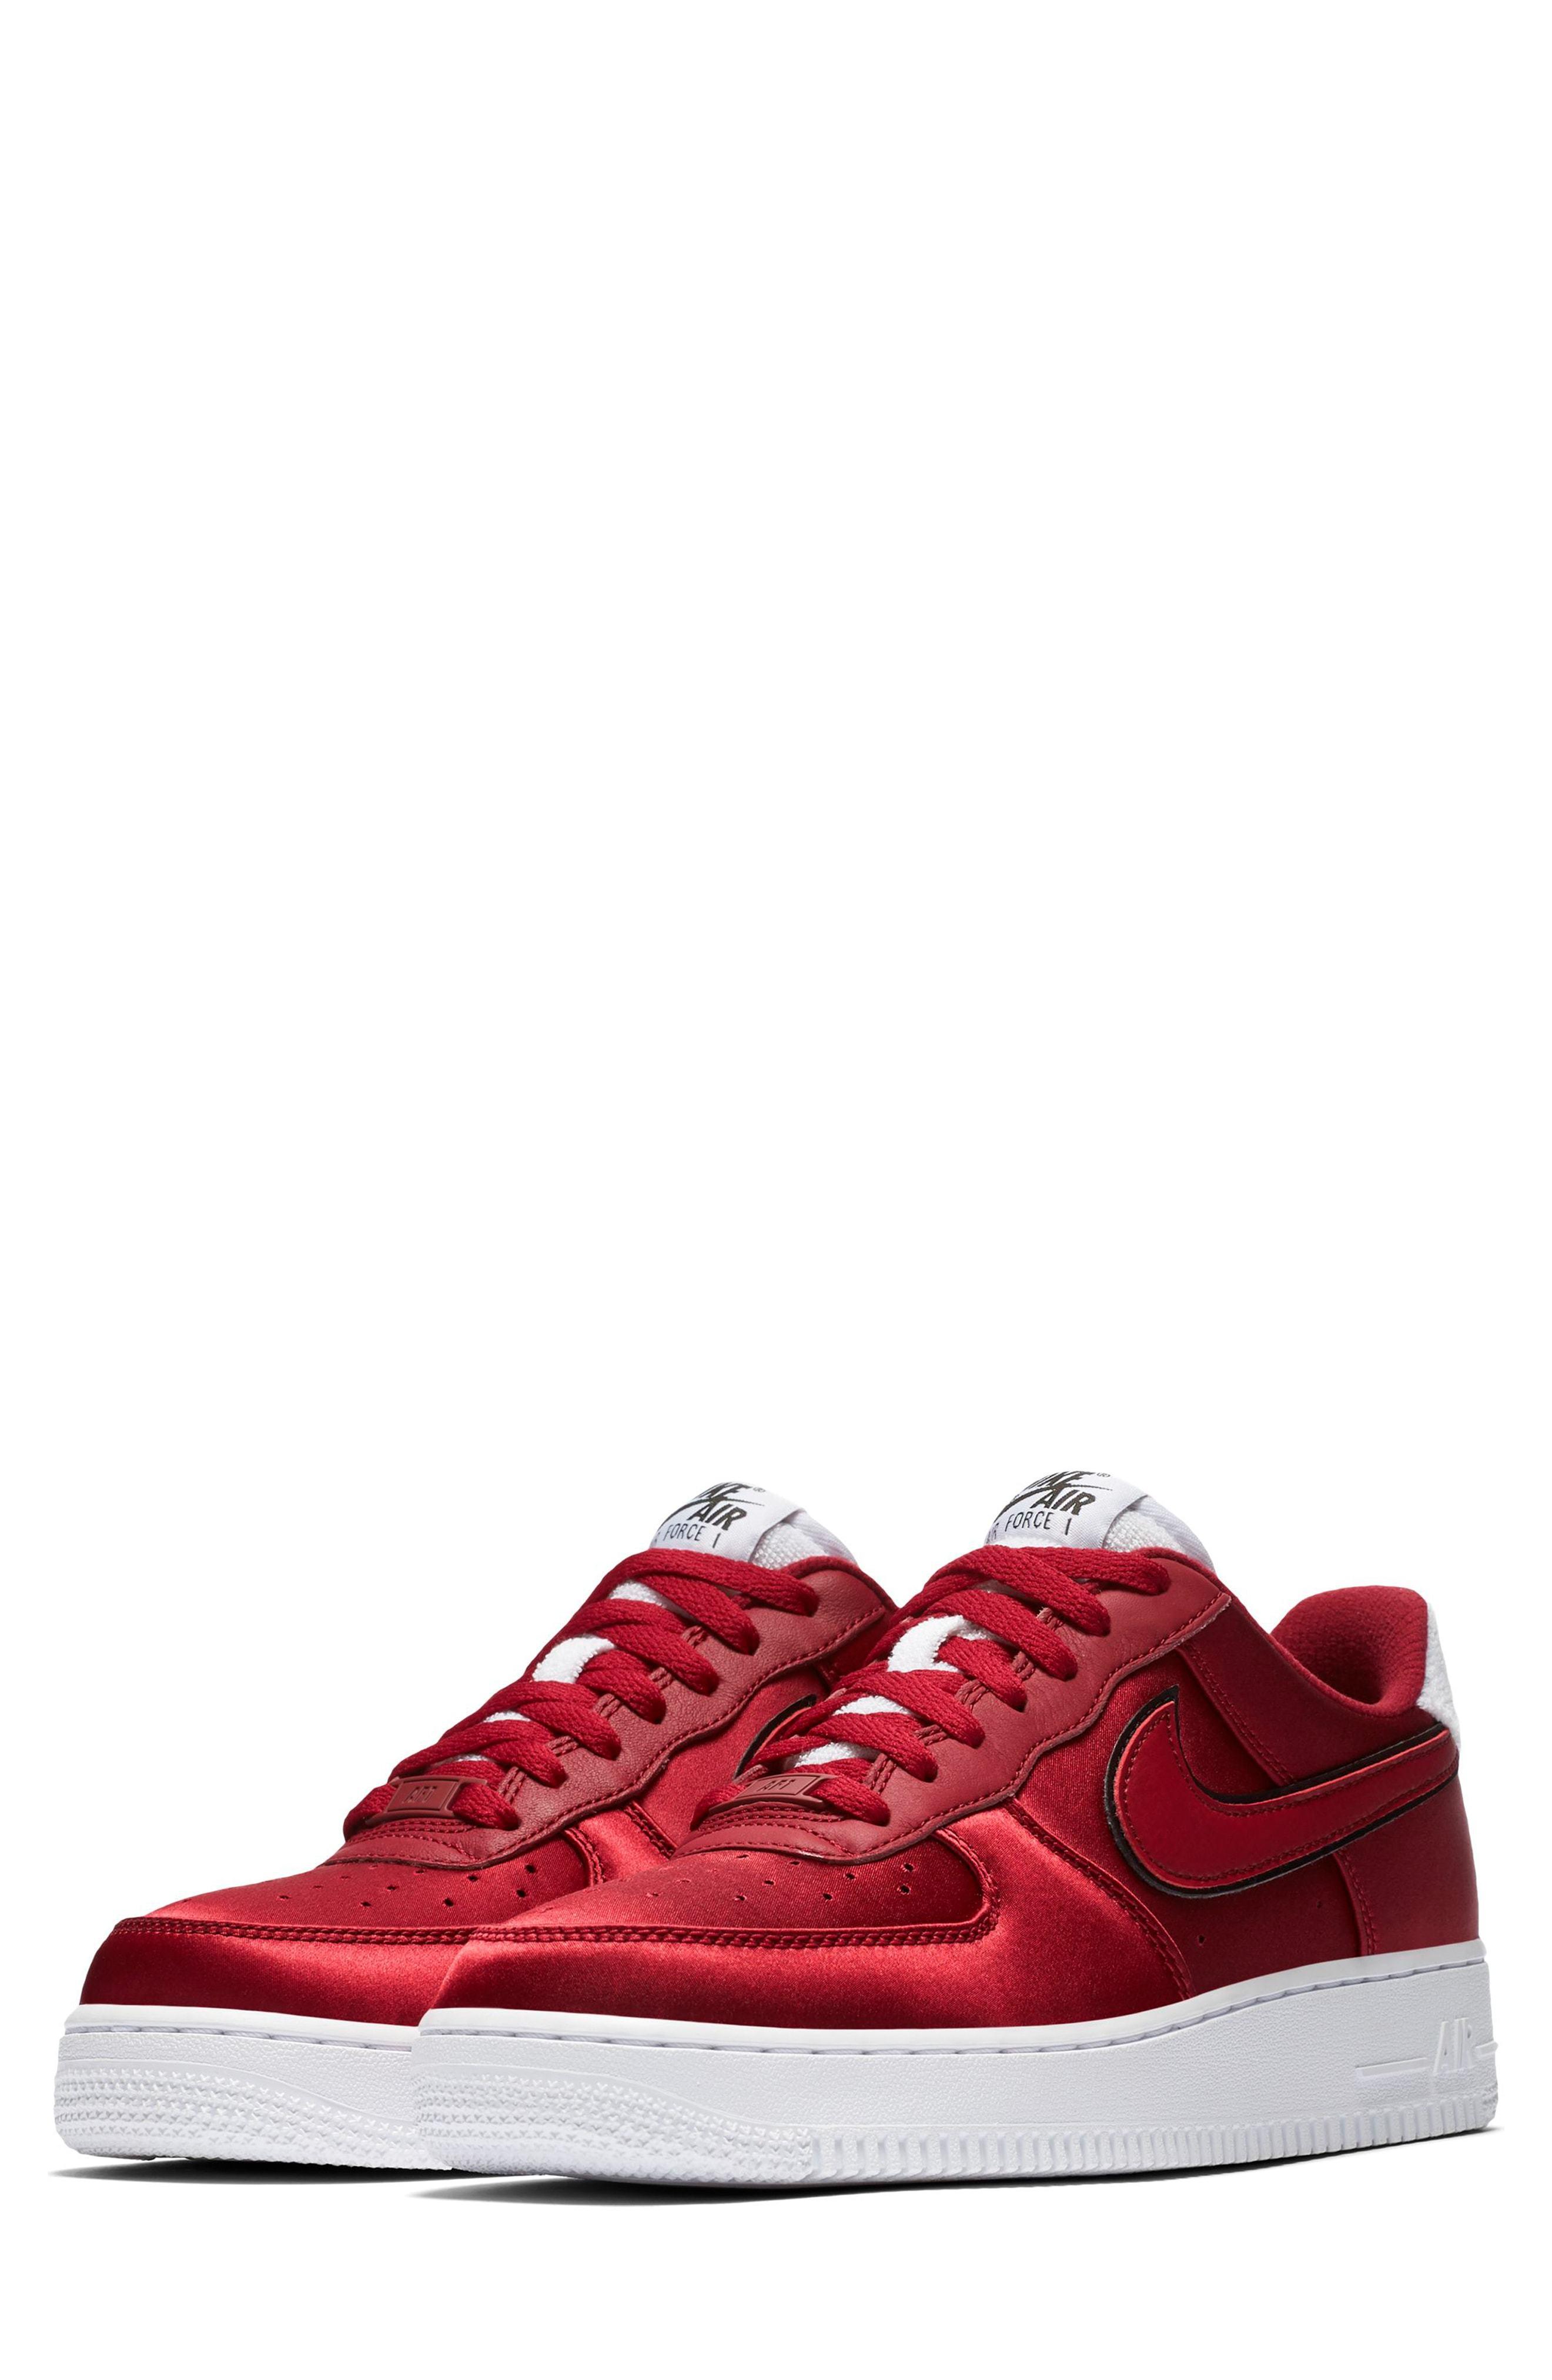 best sneakers 09ce0 b72e8 ... Burgundy Suede Low Top Sneakers Nike Air Force 1 07 Se Sneaker